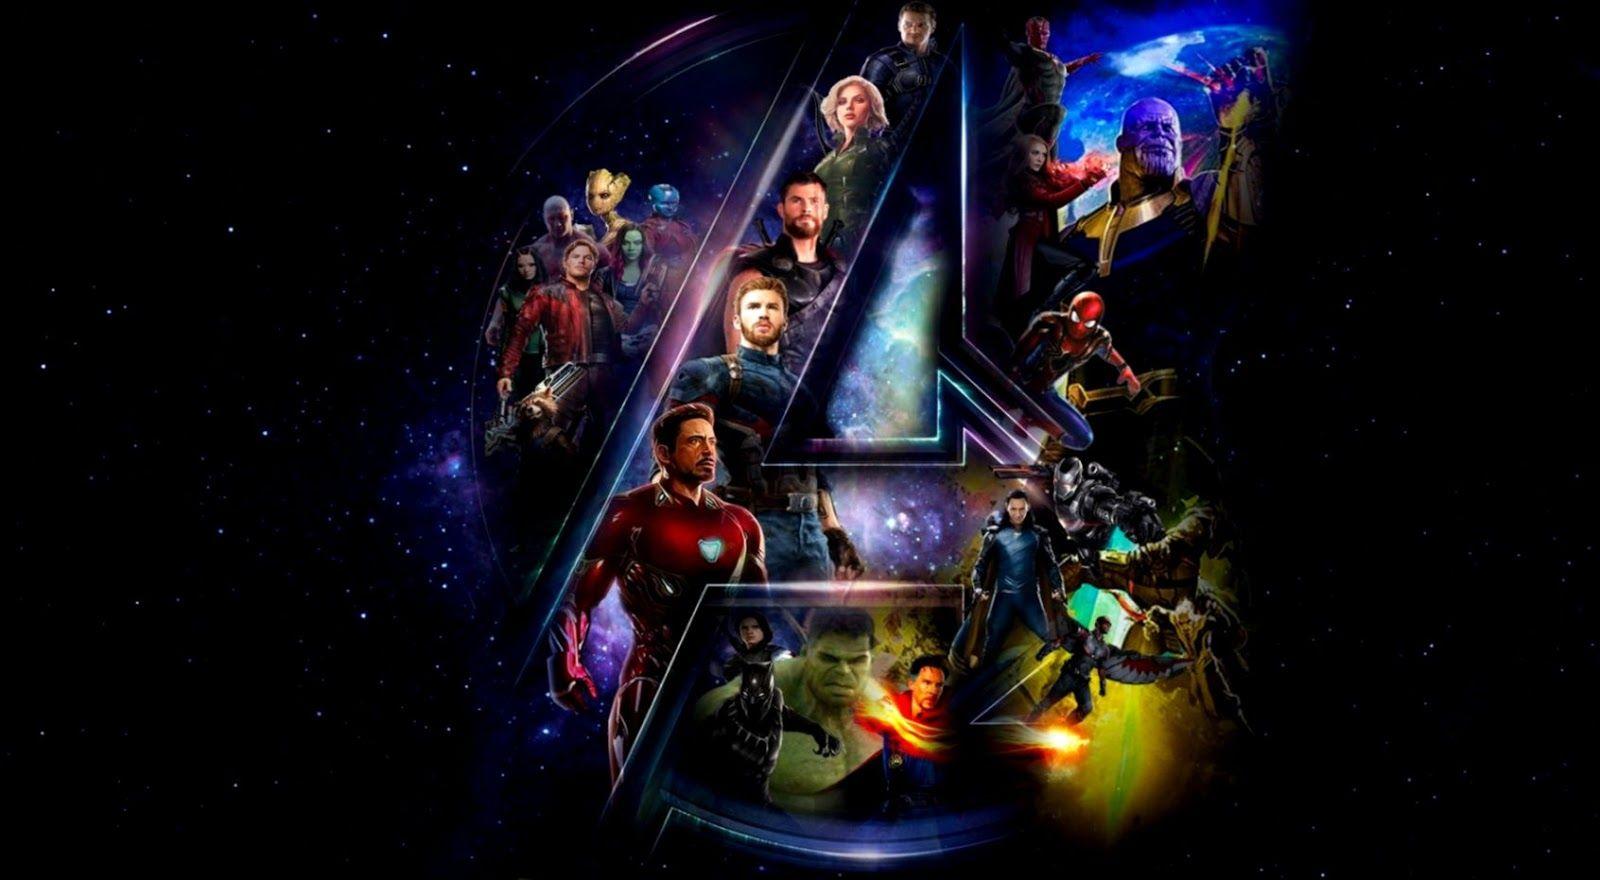 Avengers Infinity War Hd Wallpapers Marvel Infinity War Avengers Wallpaper Avengers Infinity War